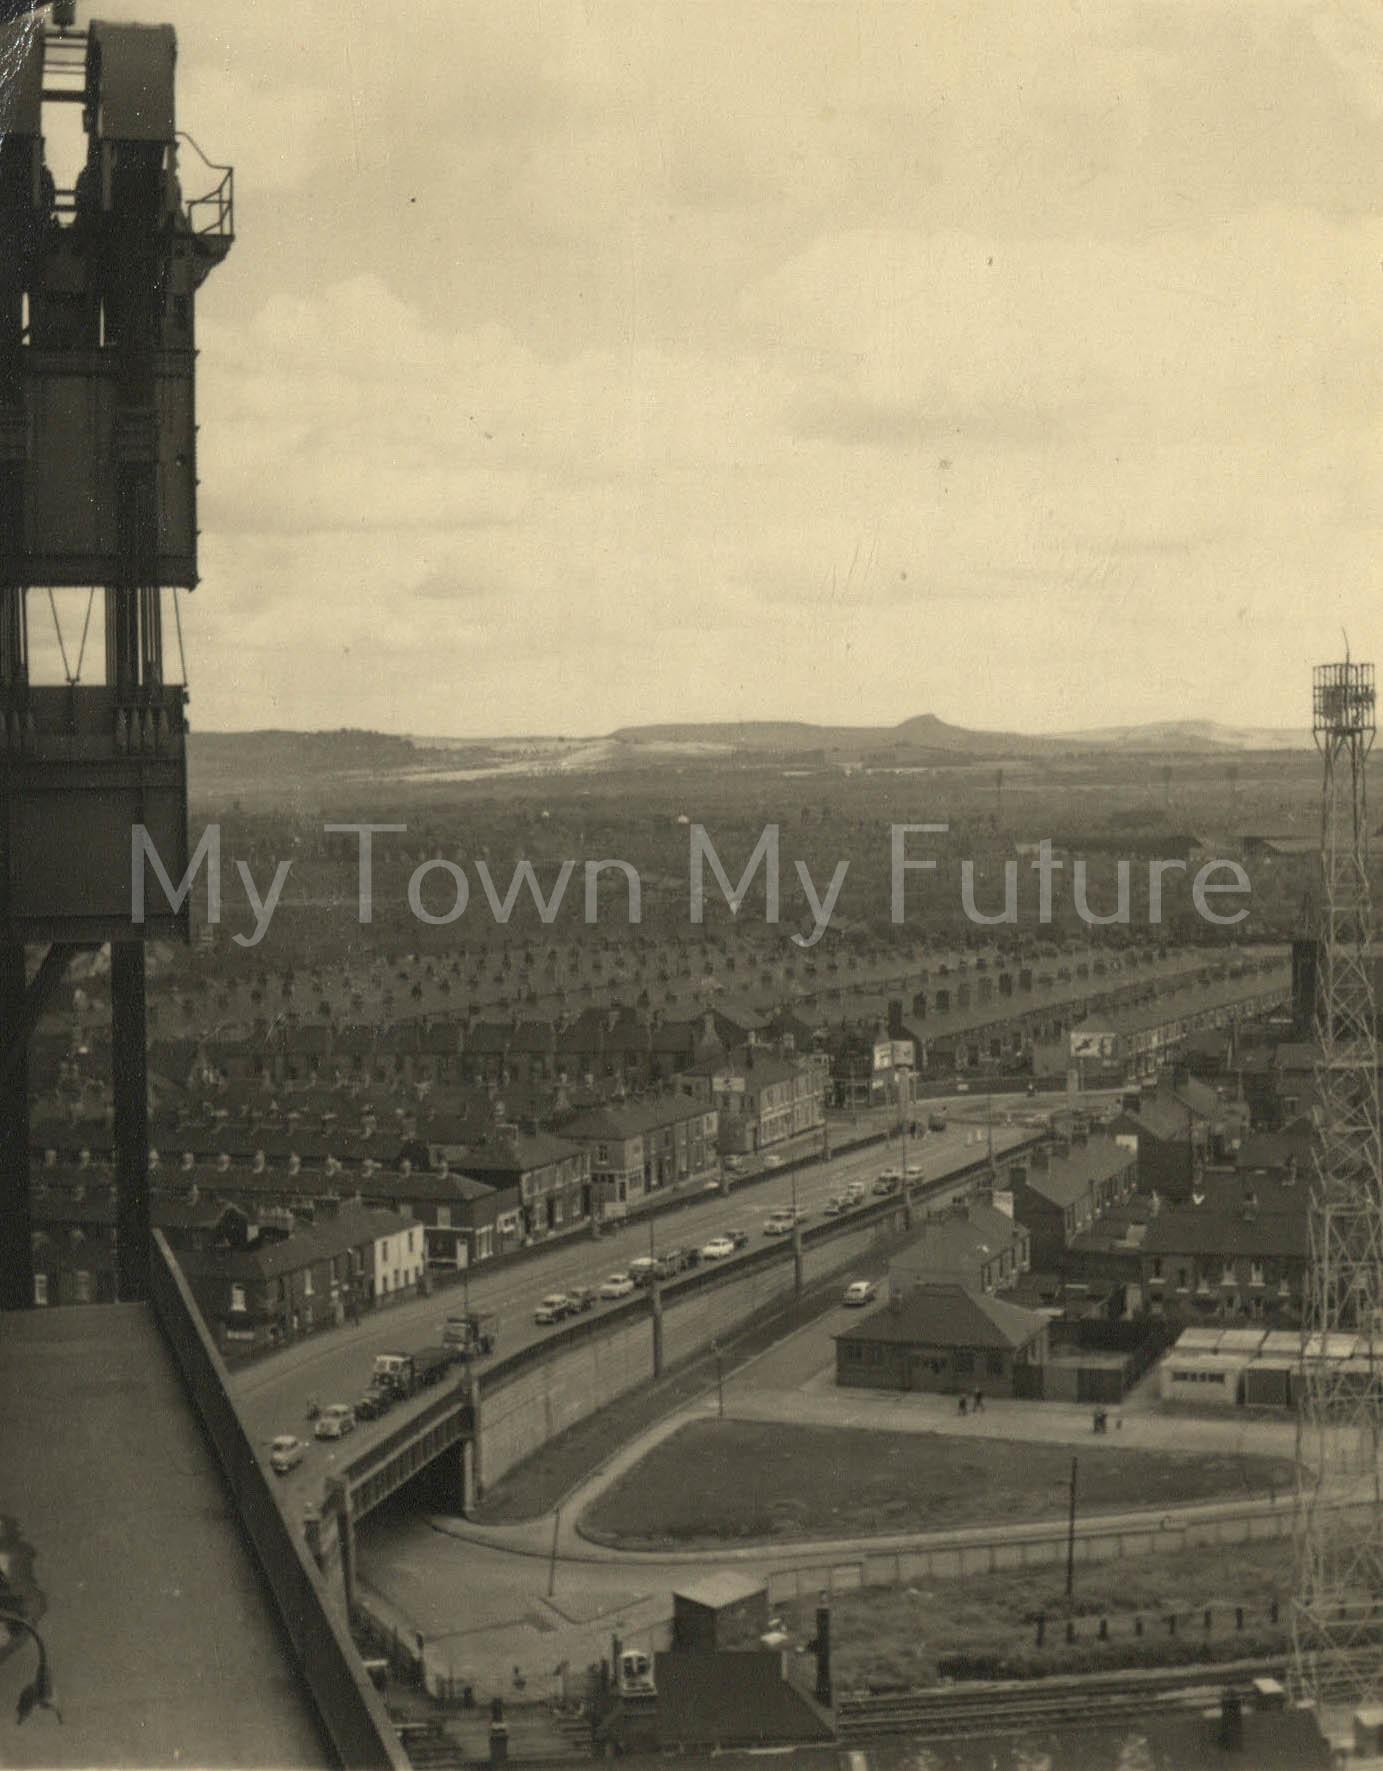 Newport Bridge - Marian Flint Collection